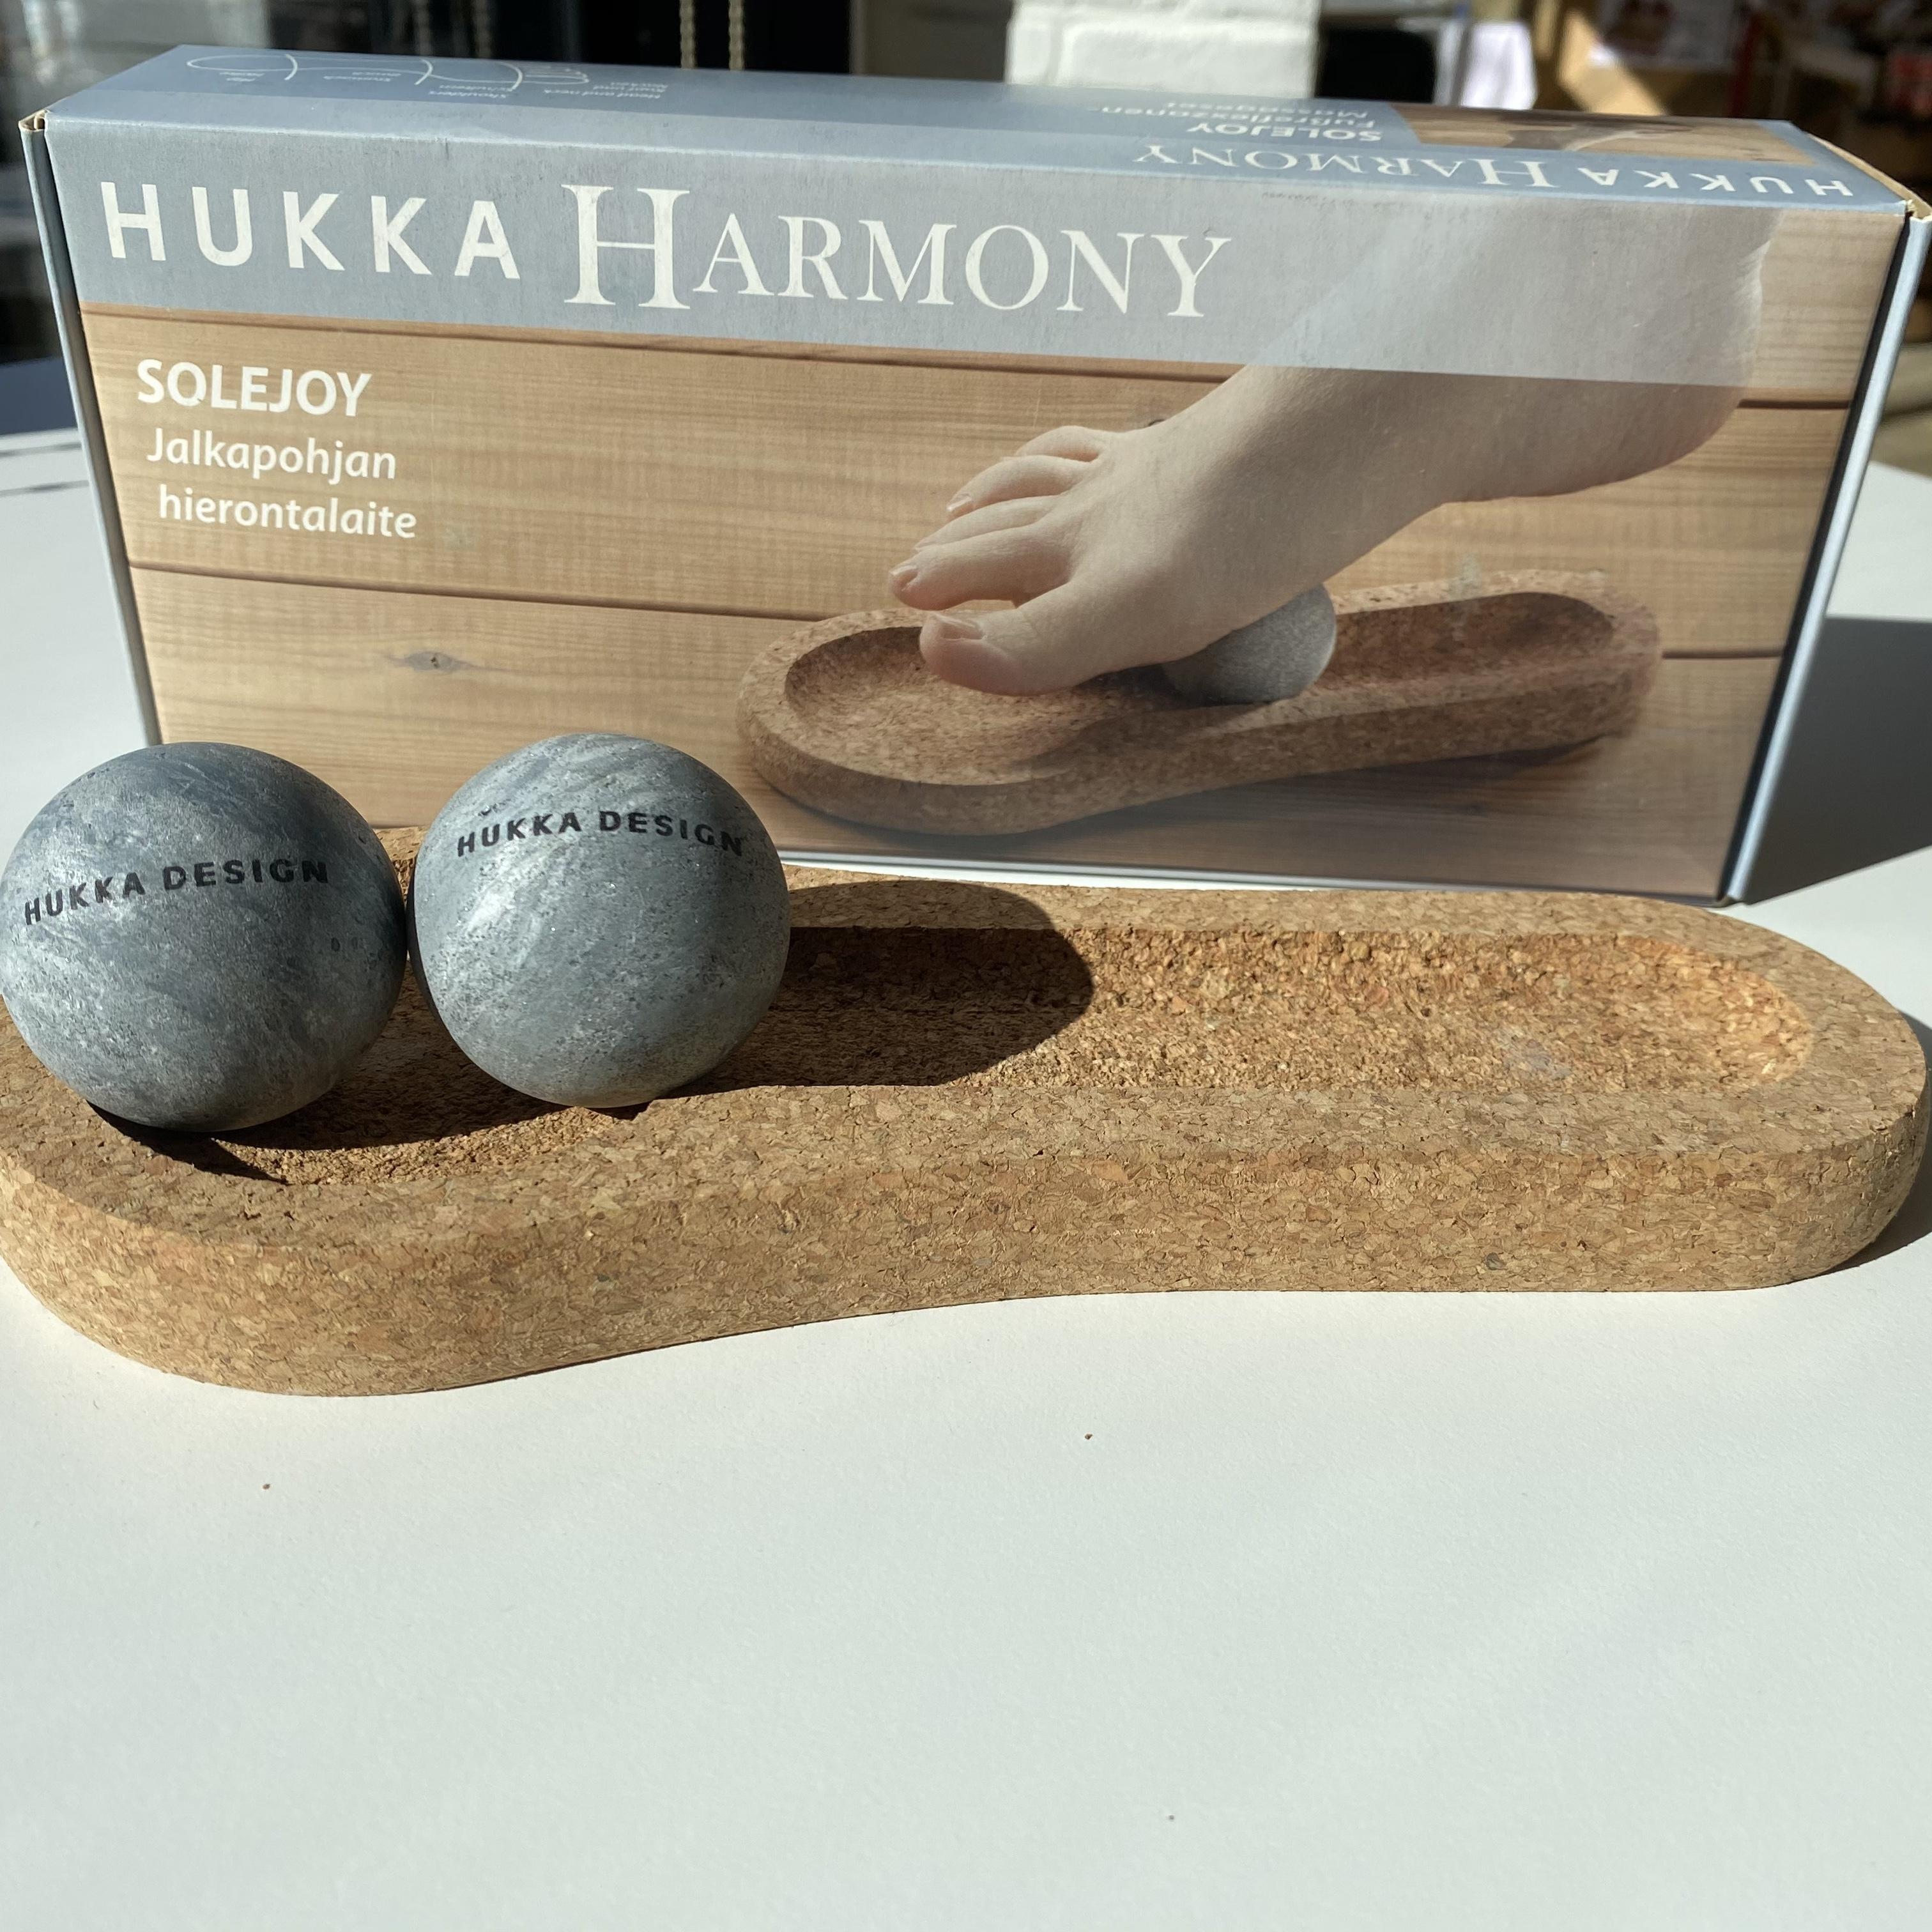 HUKKA DESIGN ソールジョイ マッサージボールセット(ボール2個付)